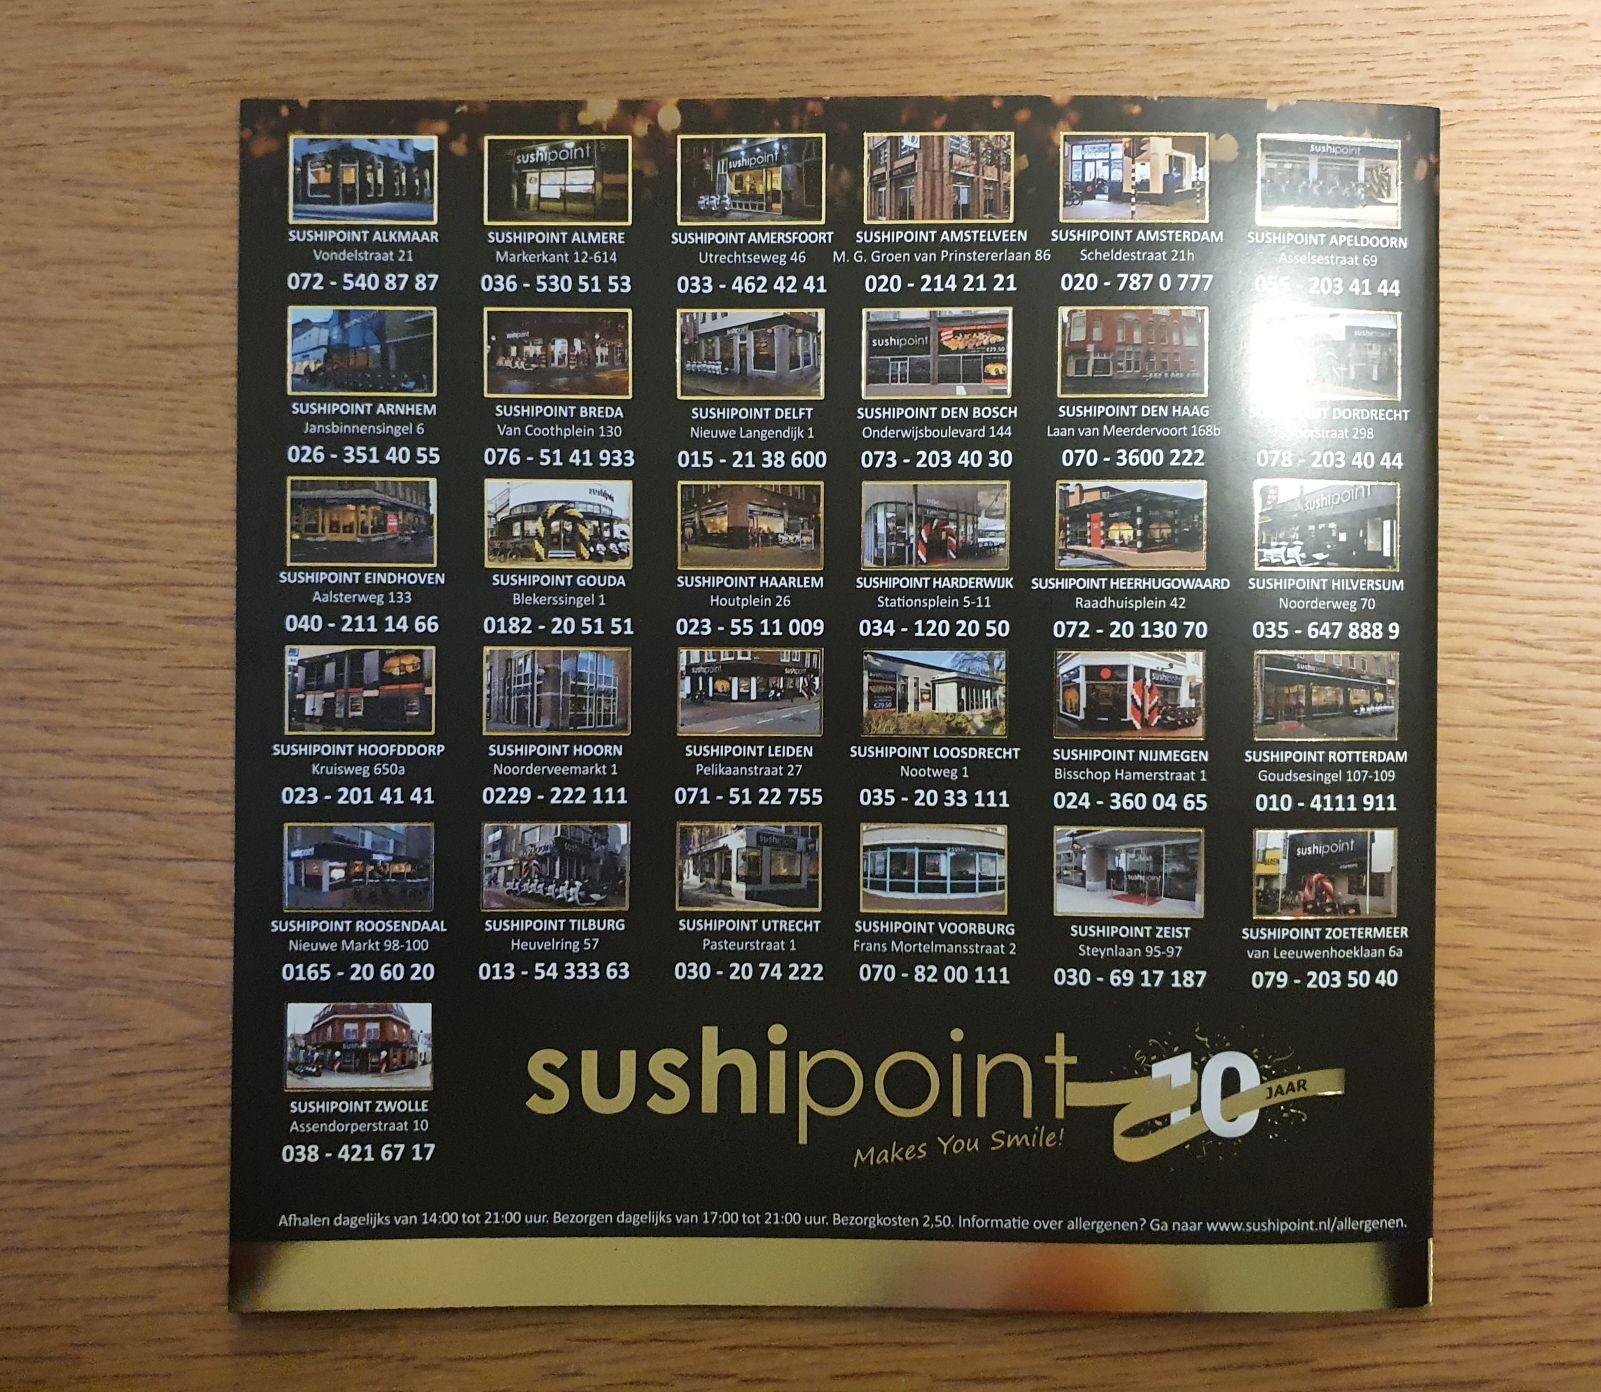 Sushi point €7,50 korting bij besteding €25